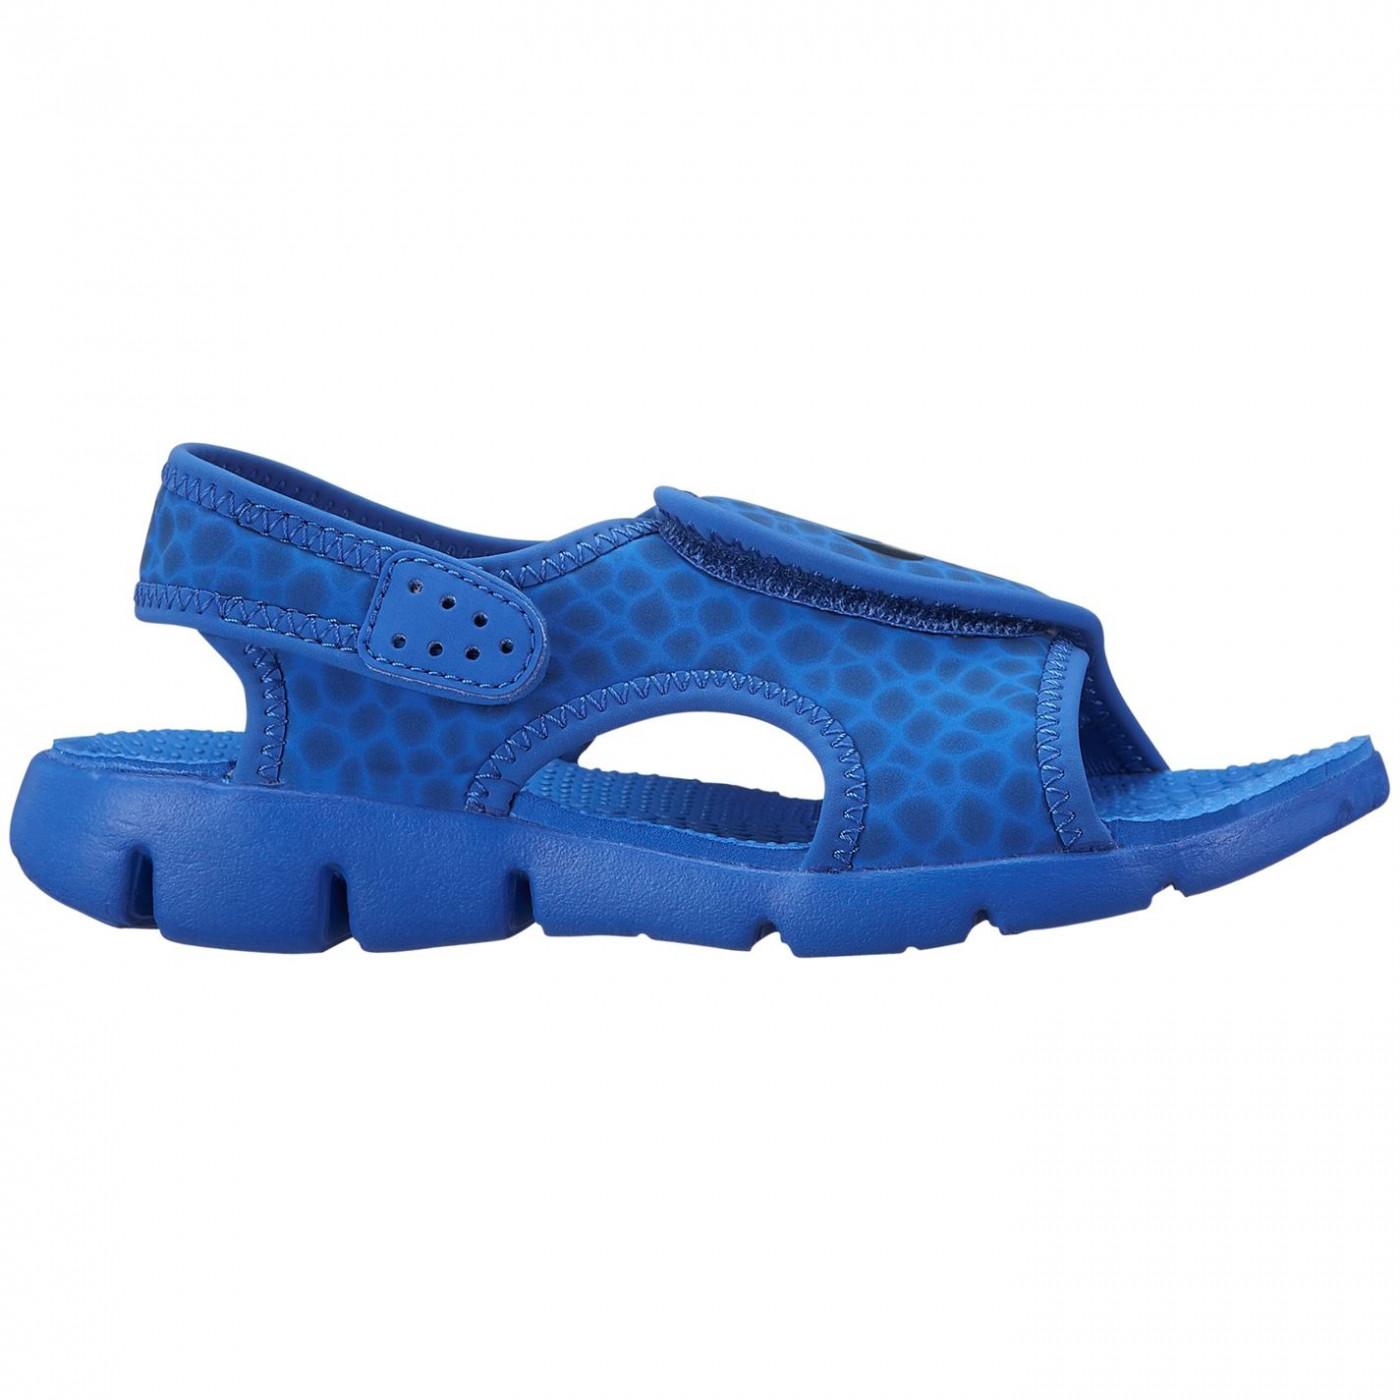 5b347b67ff2 Nike Sunray Adjust 4 Boys Sandal - FACTCOOL